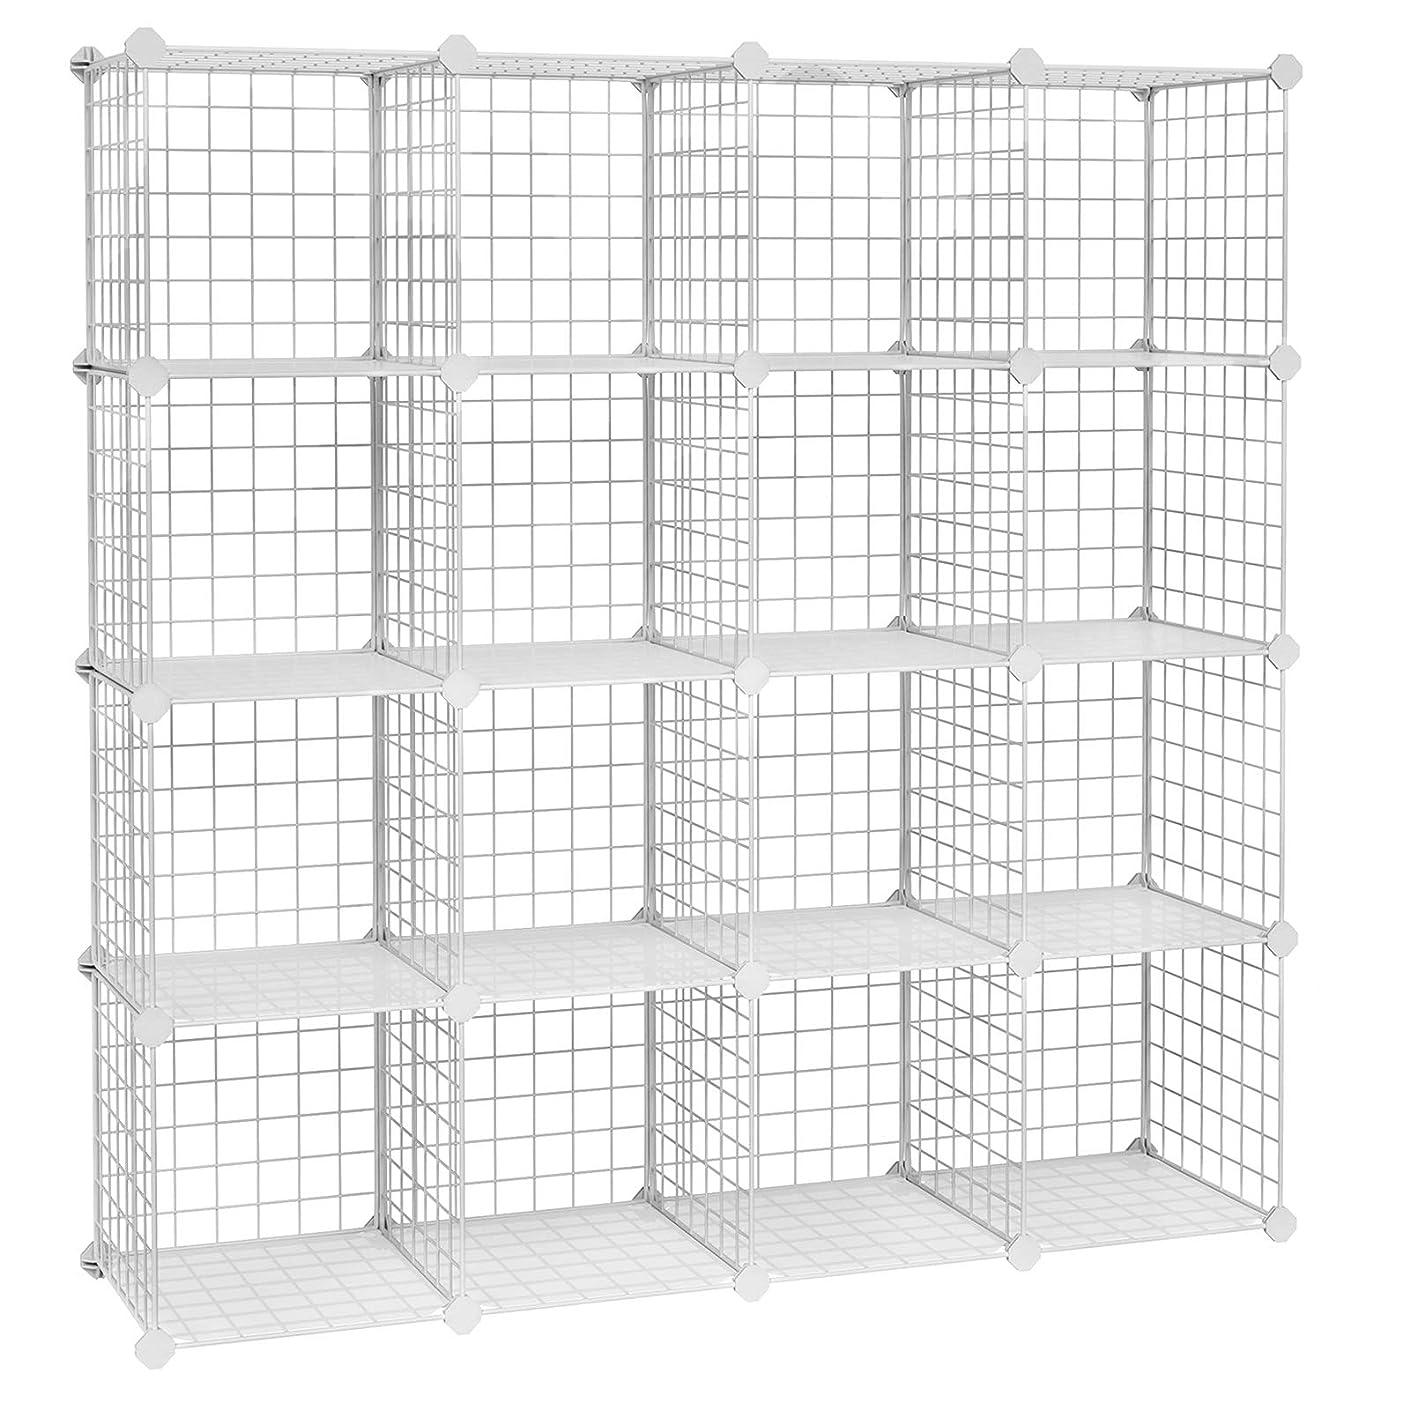 "SONGMICS Metal Wire Cube Storage,16-Cube Shelves Organizer,Stackable Storage Bins, Modular Bookcase, DIY Closet Cabinet Shelf, 48.4""L x 12.2""W x 48.4""H, White ULPI44W"